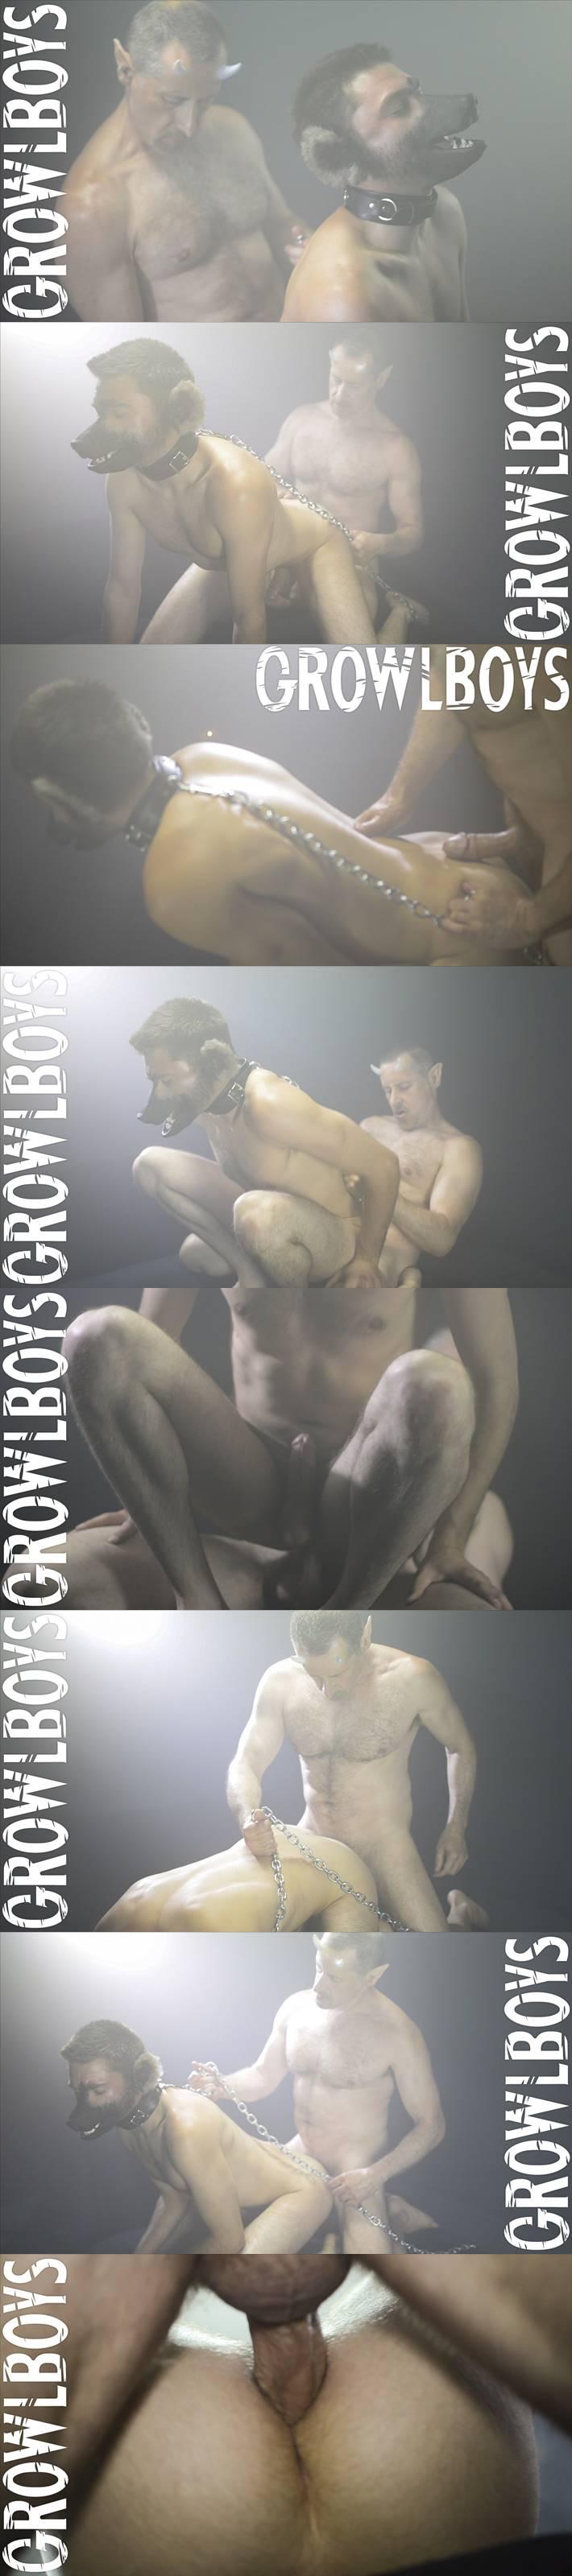 Growl Boys - Lost Boys: Chapter 5